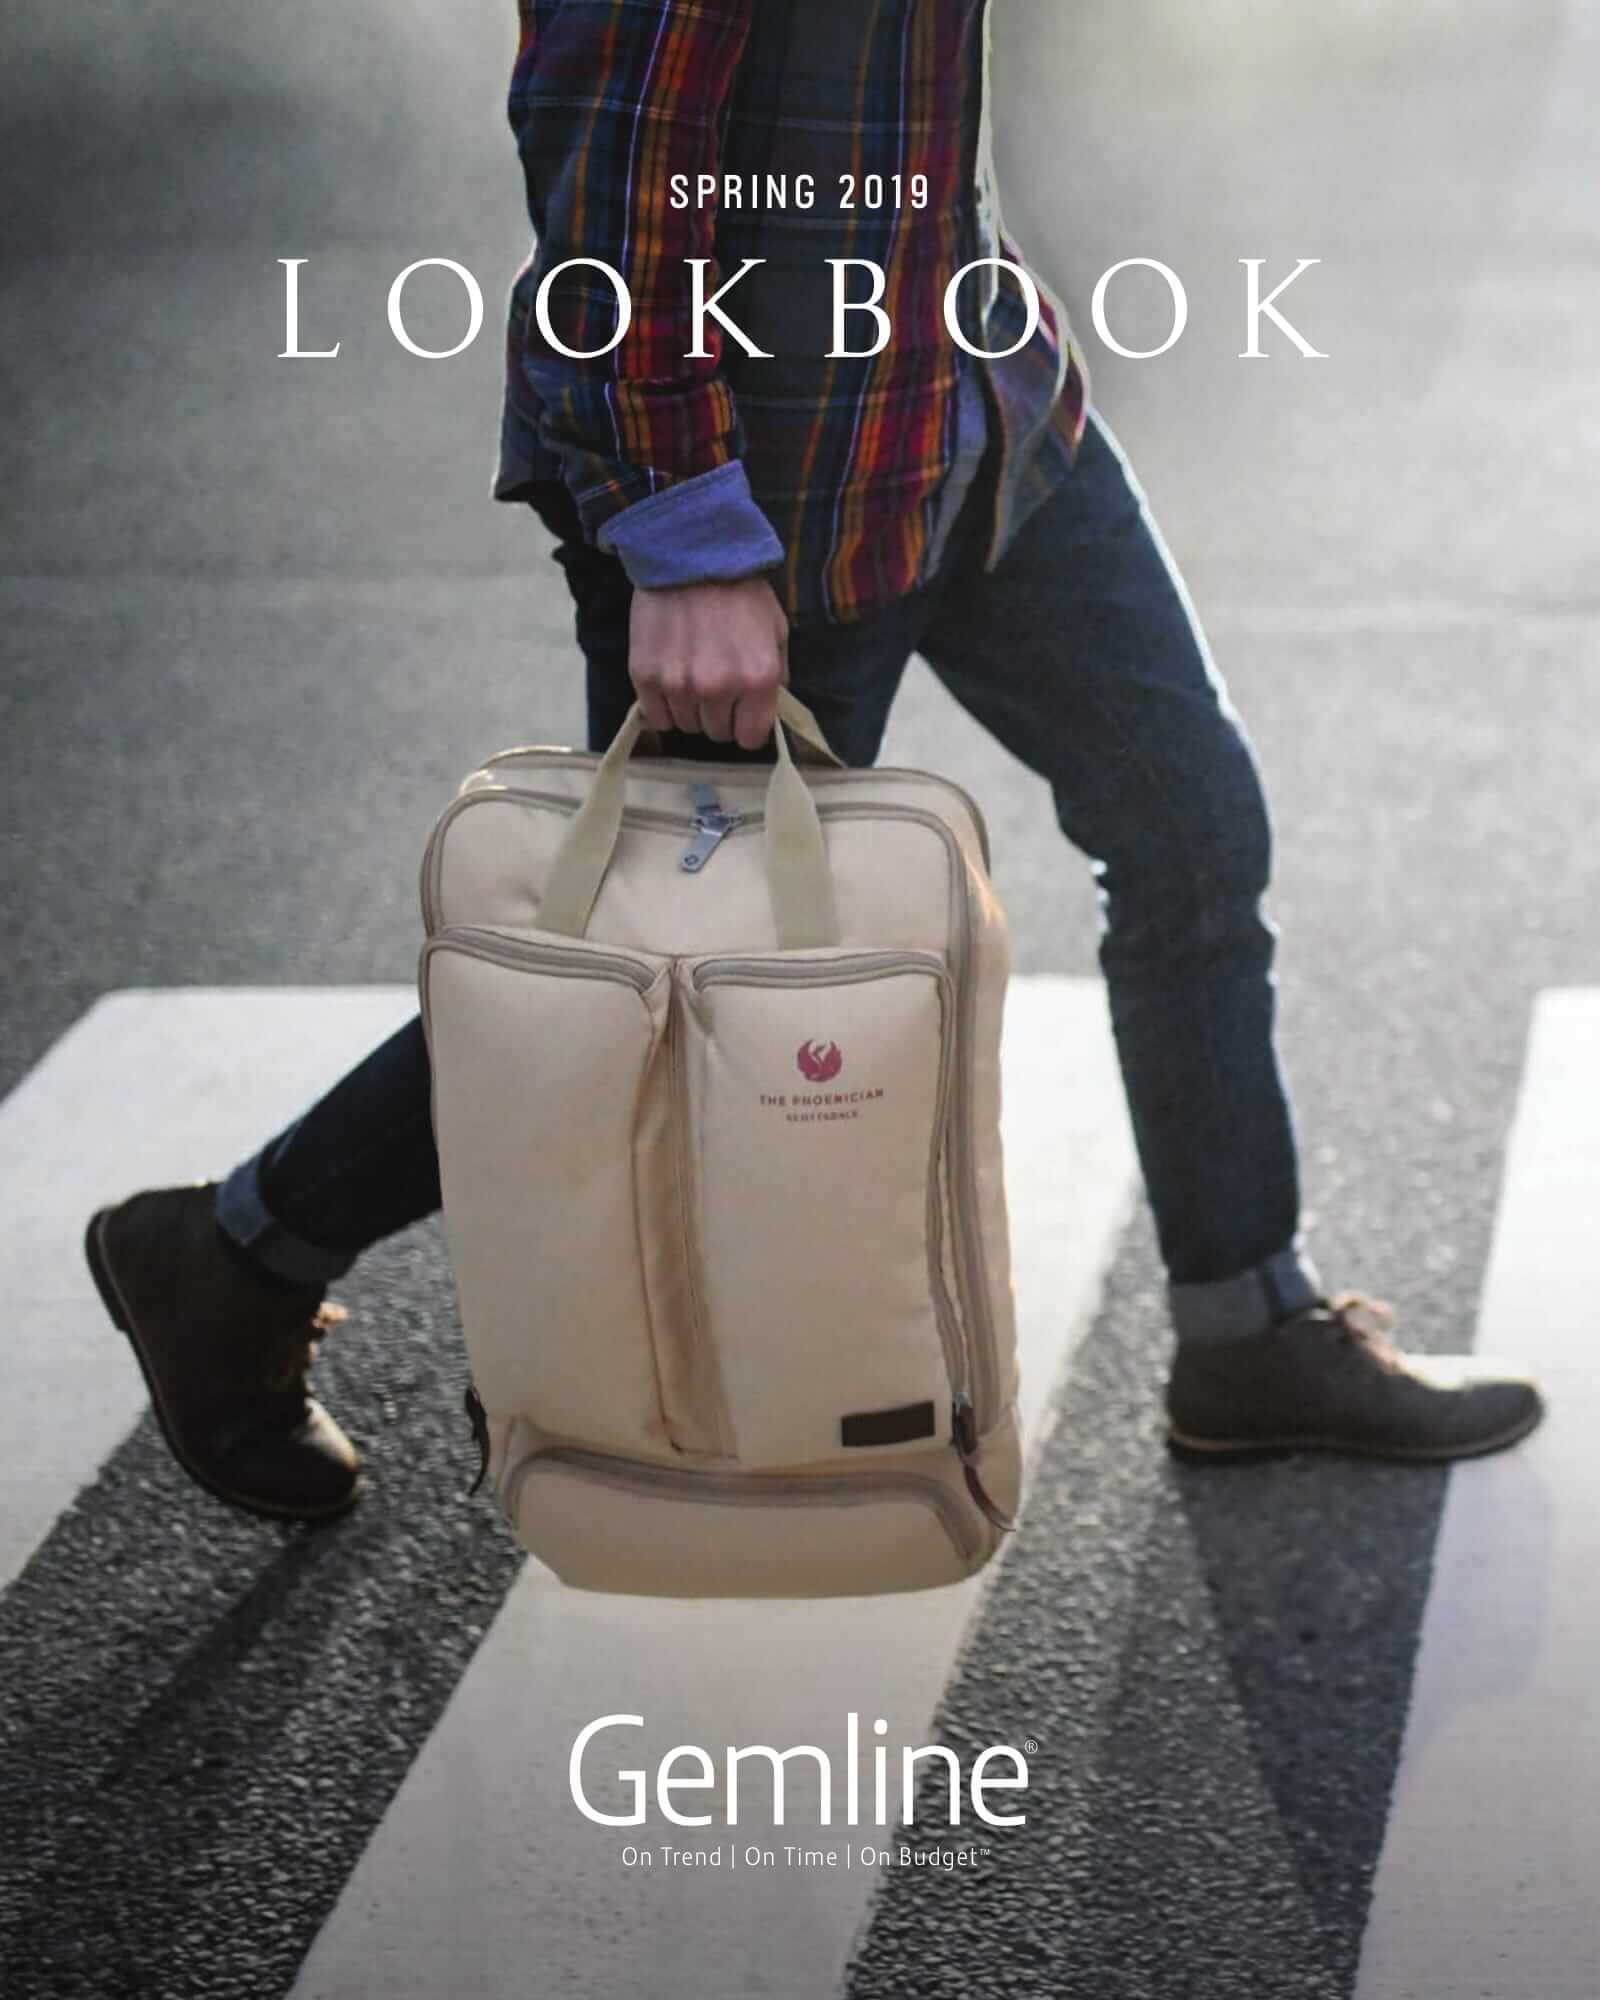 Spring 2019 Look Book